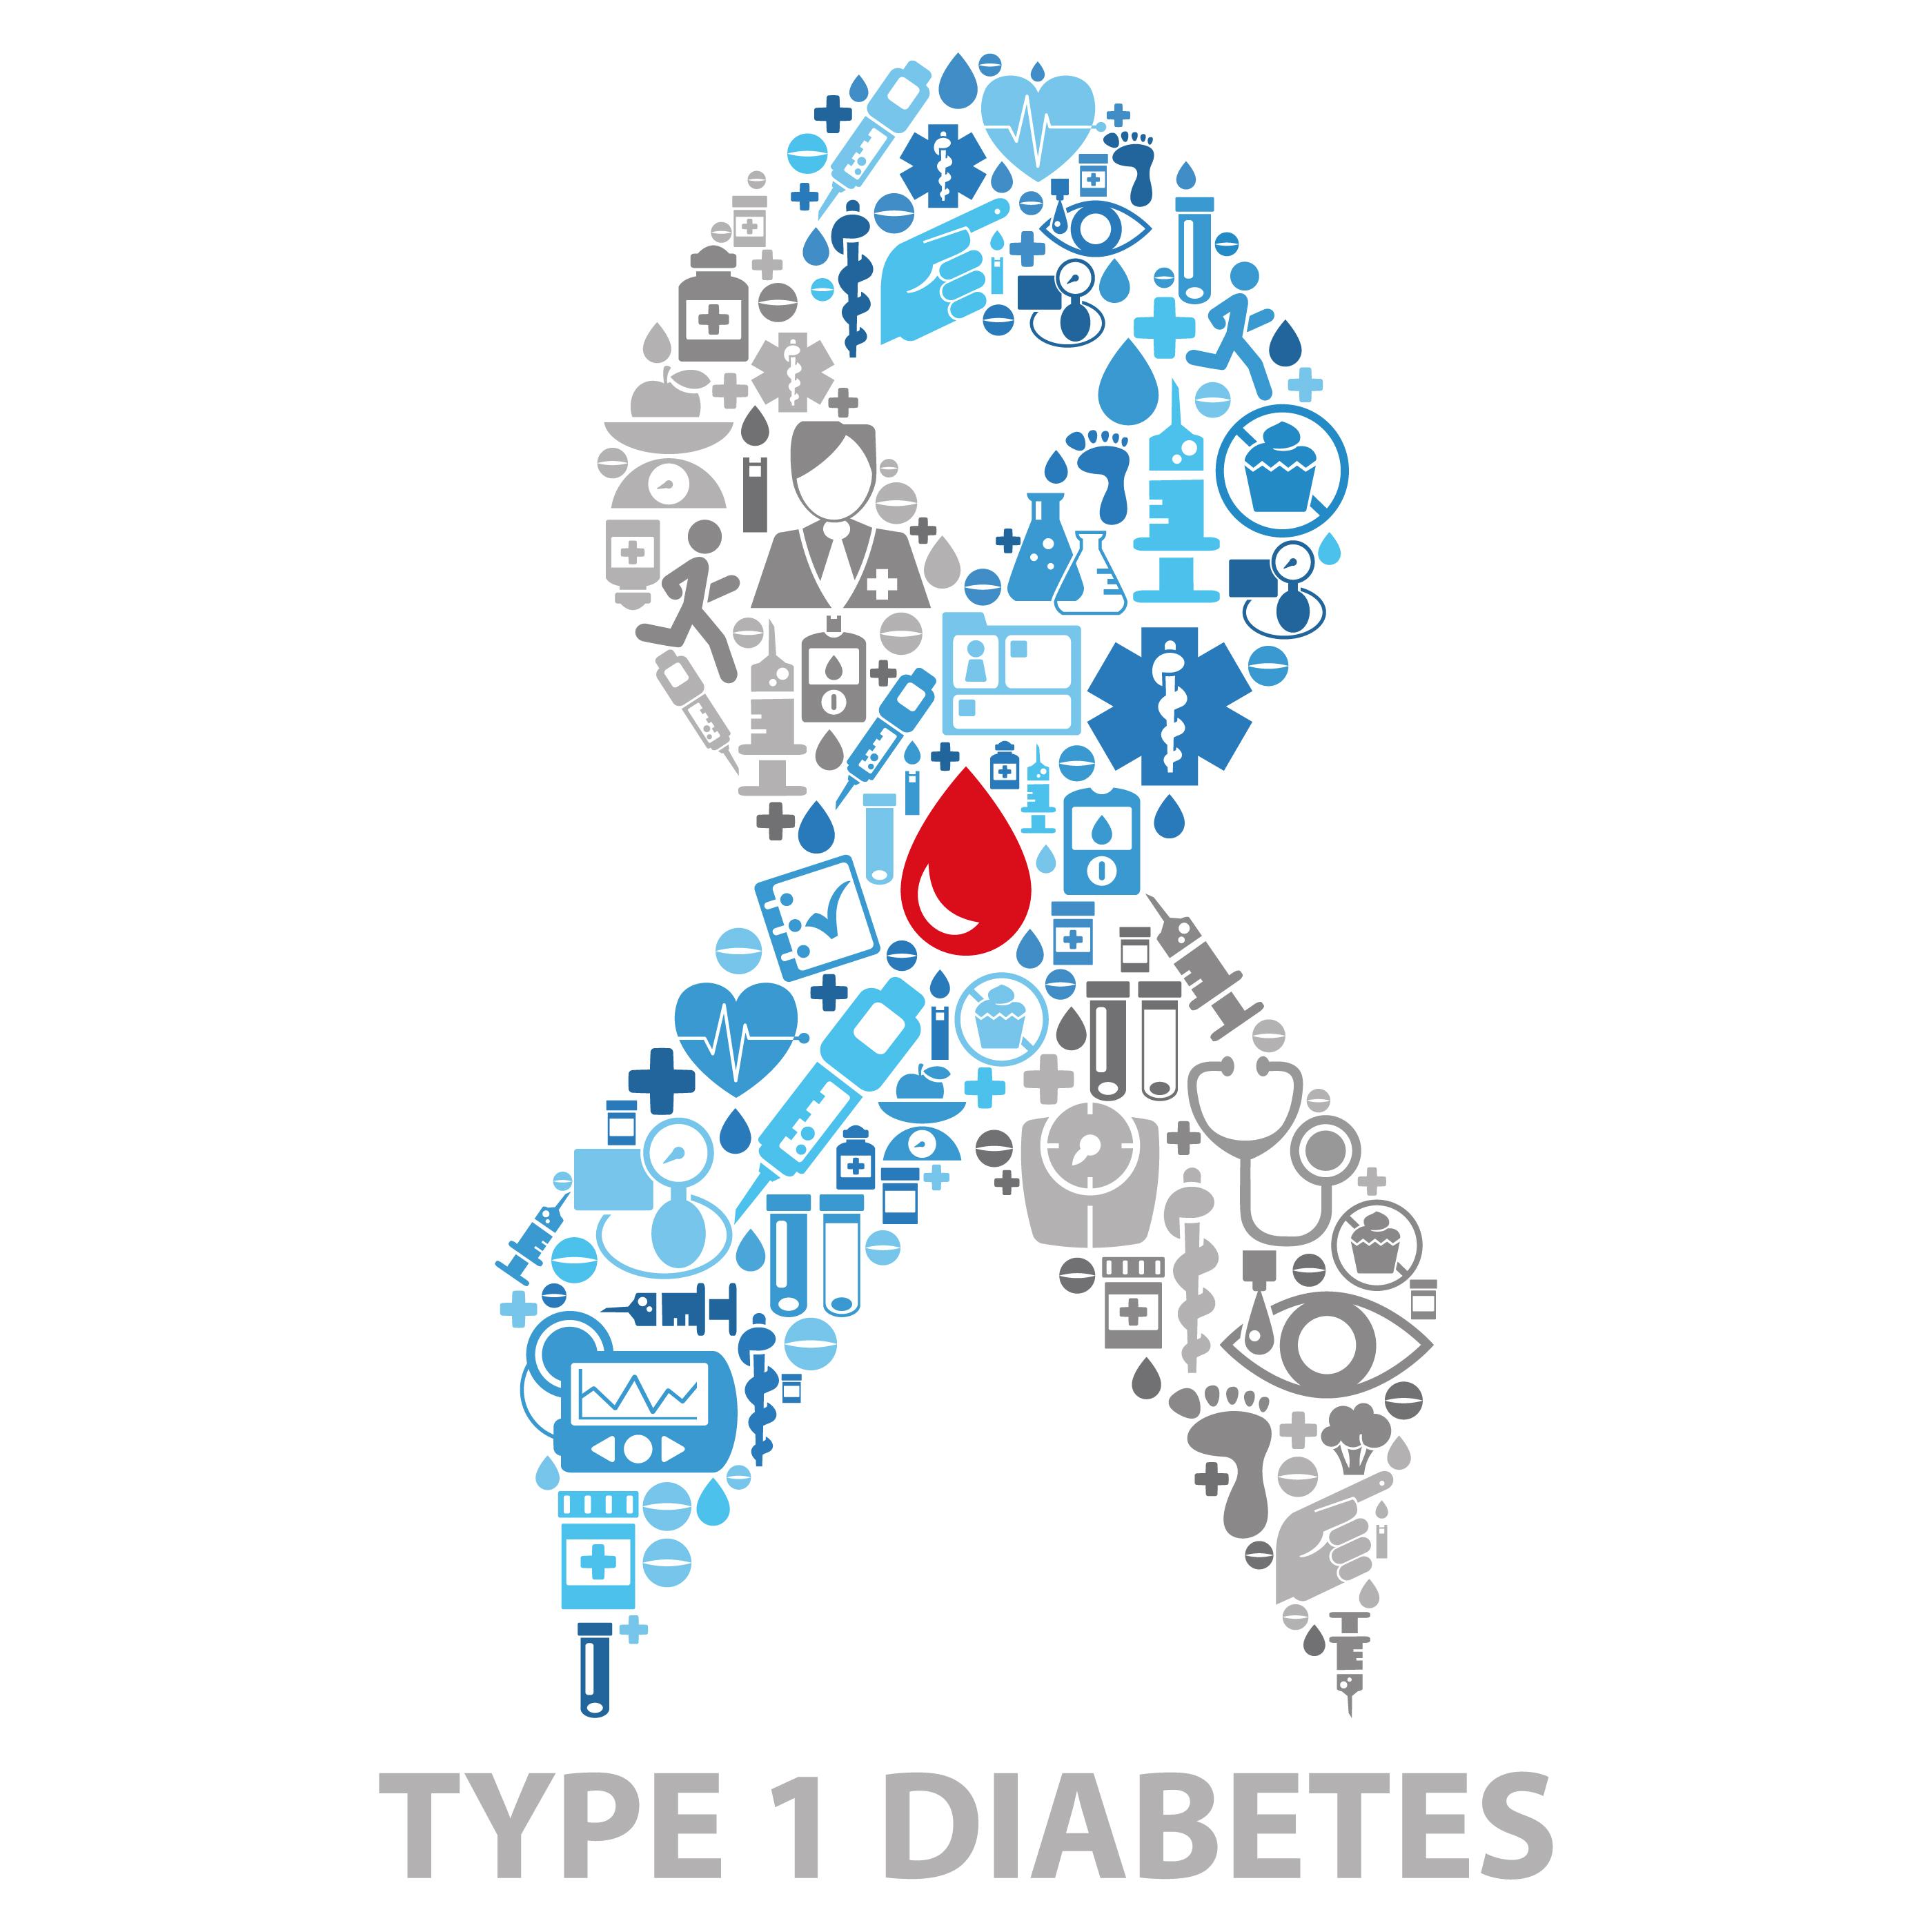 children at risk of type 1 diabetes financial tribune